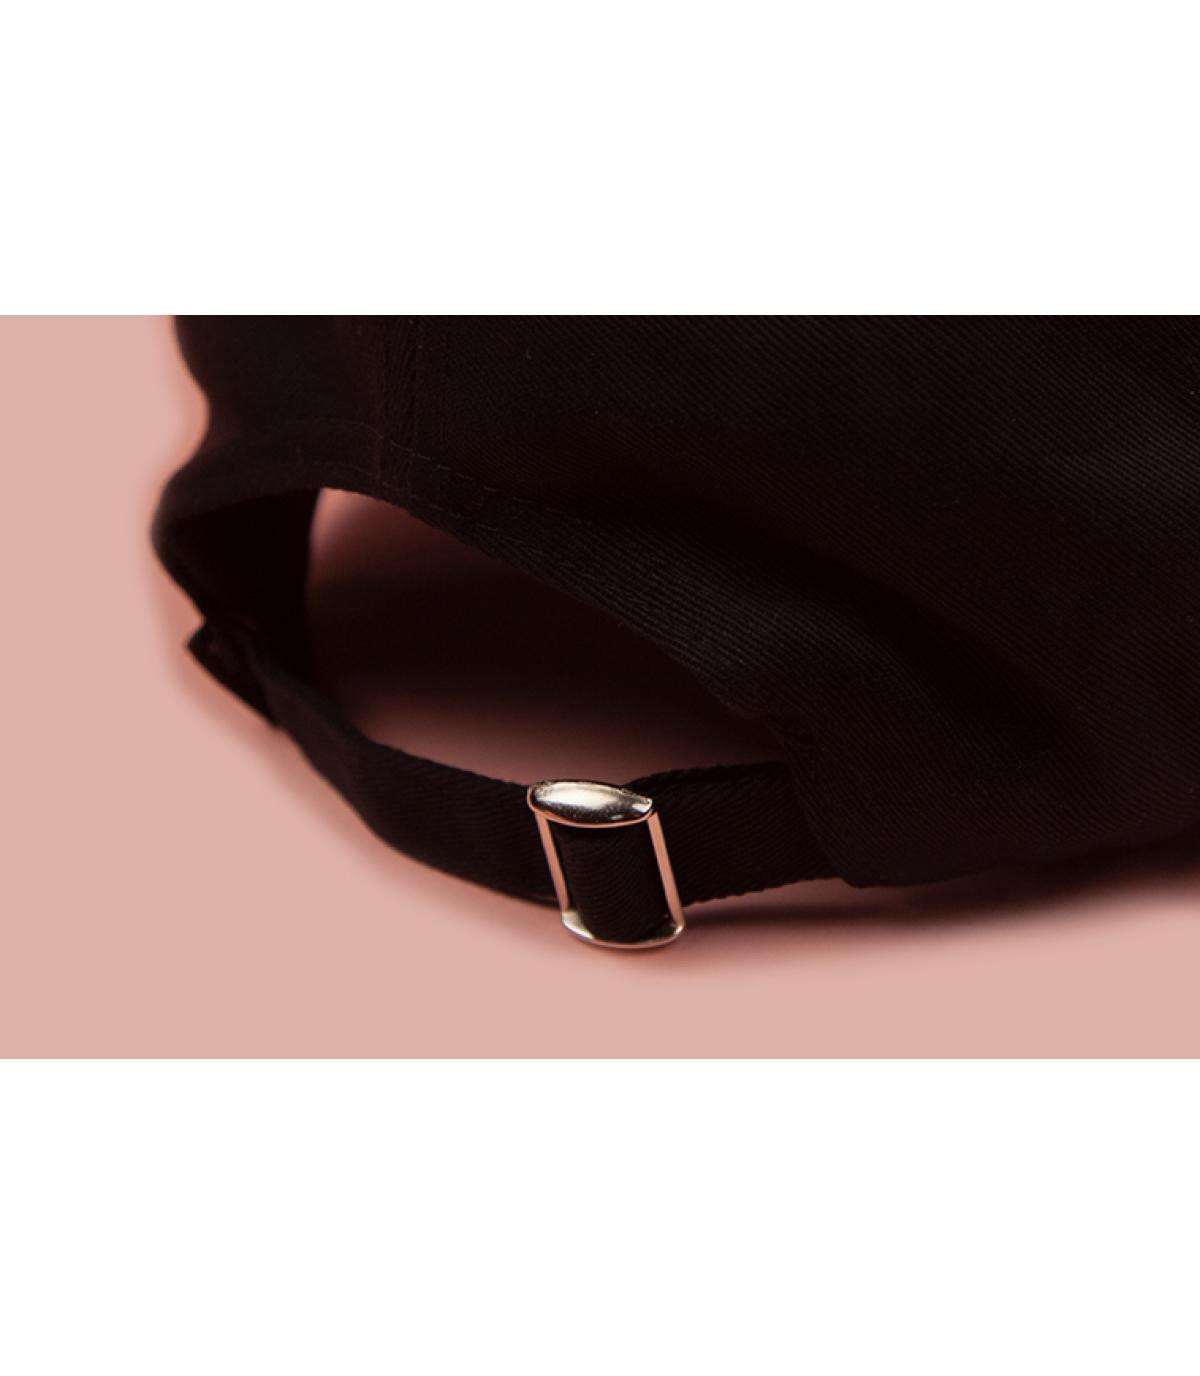 Details Curve Hand Love black white - Abbildung 4